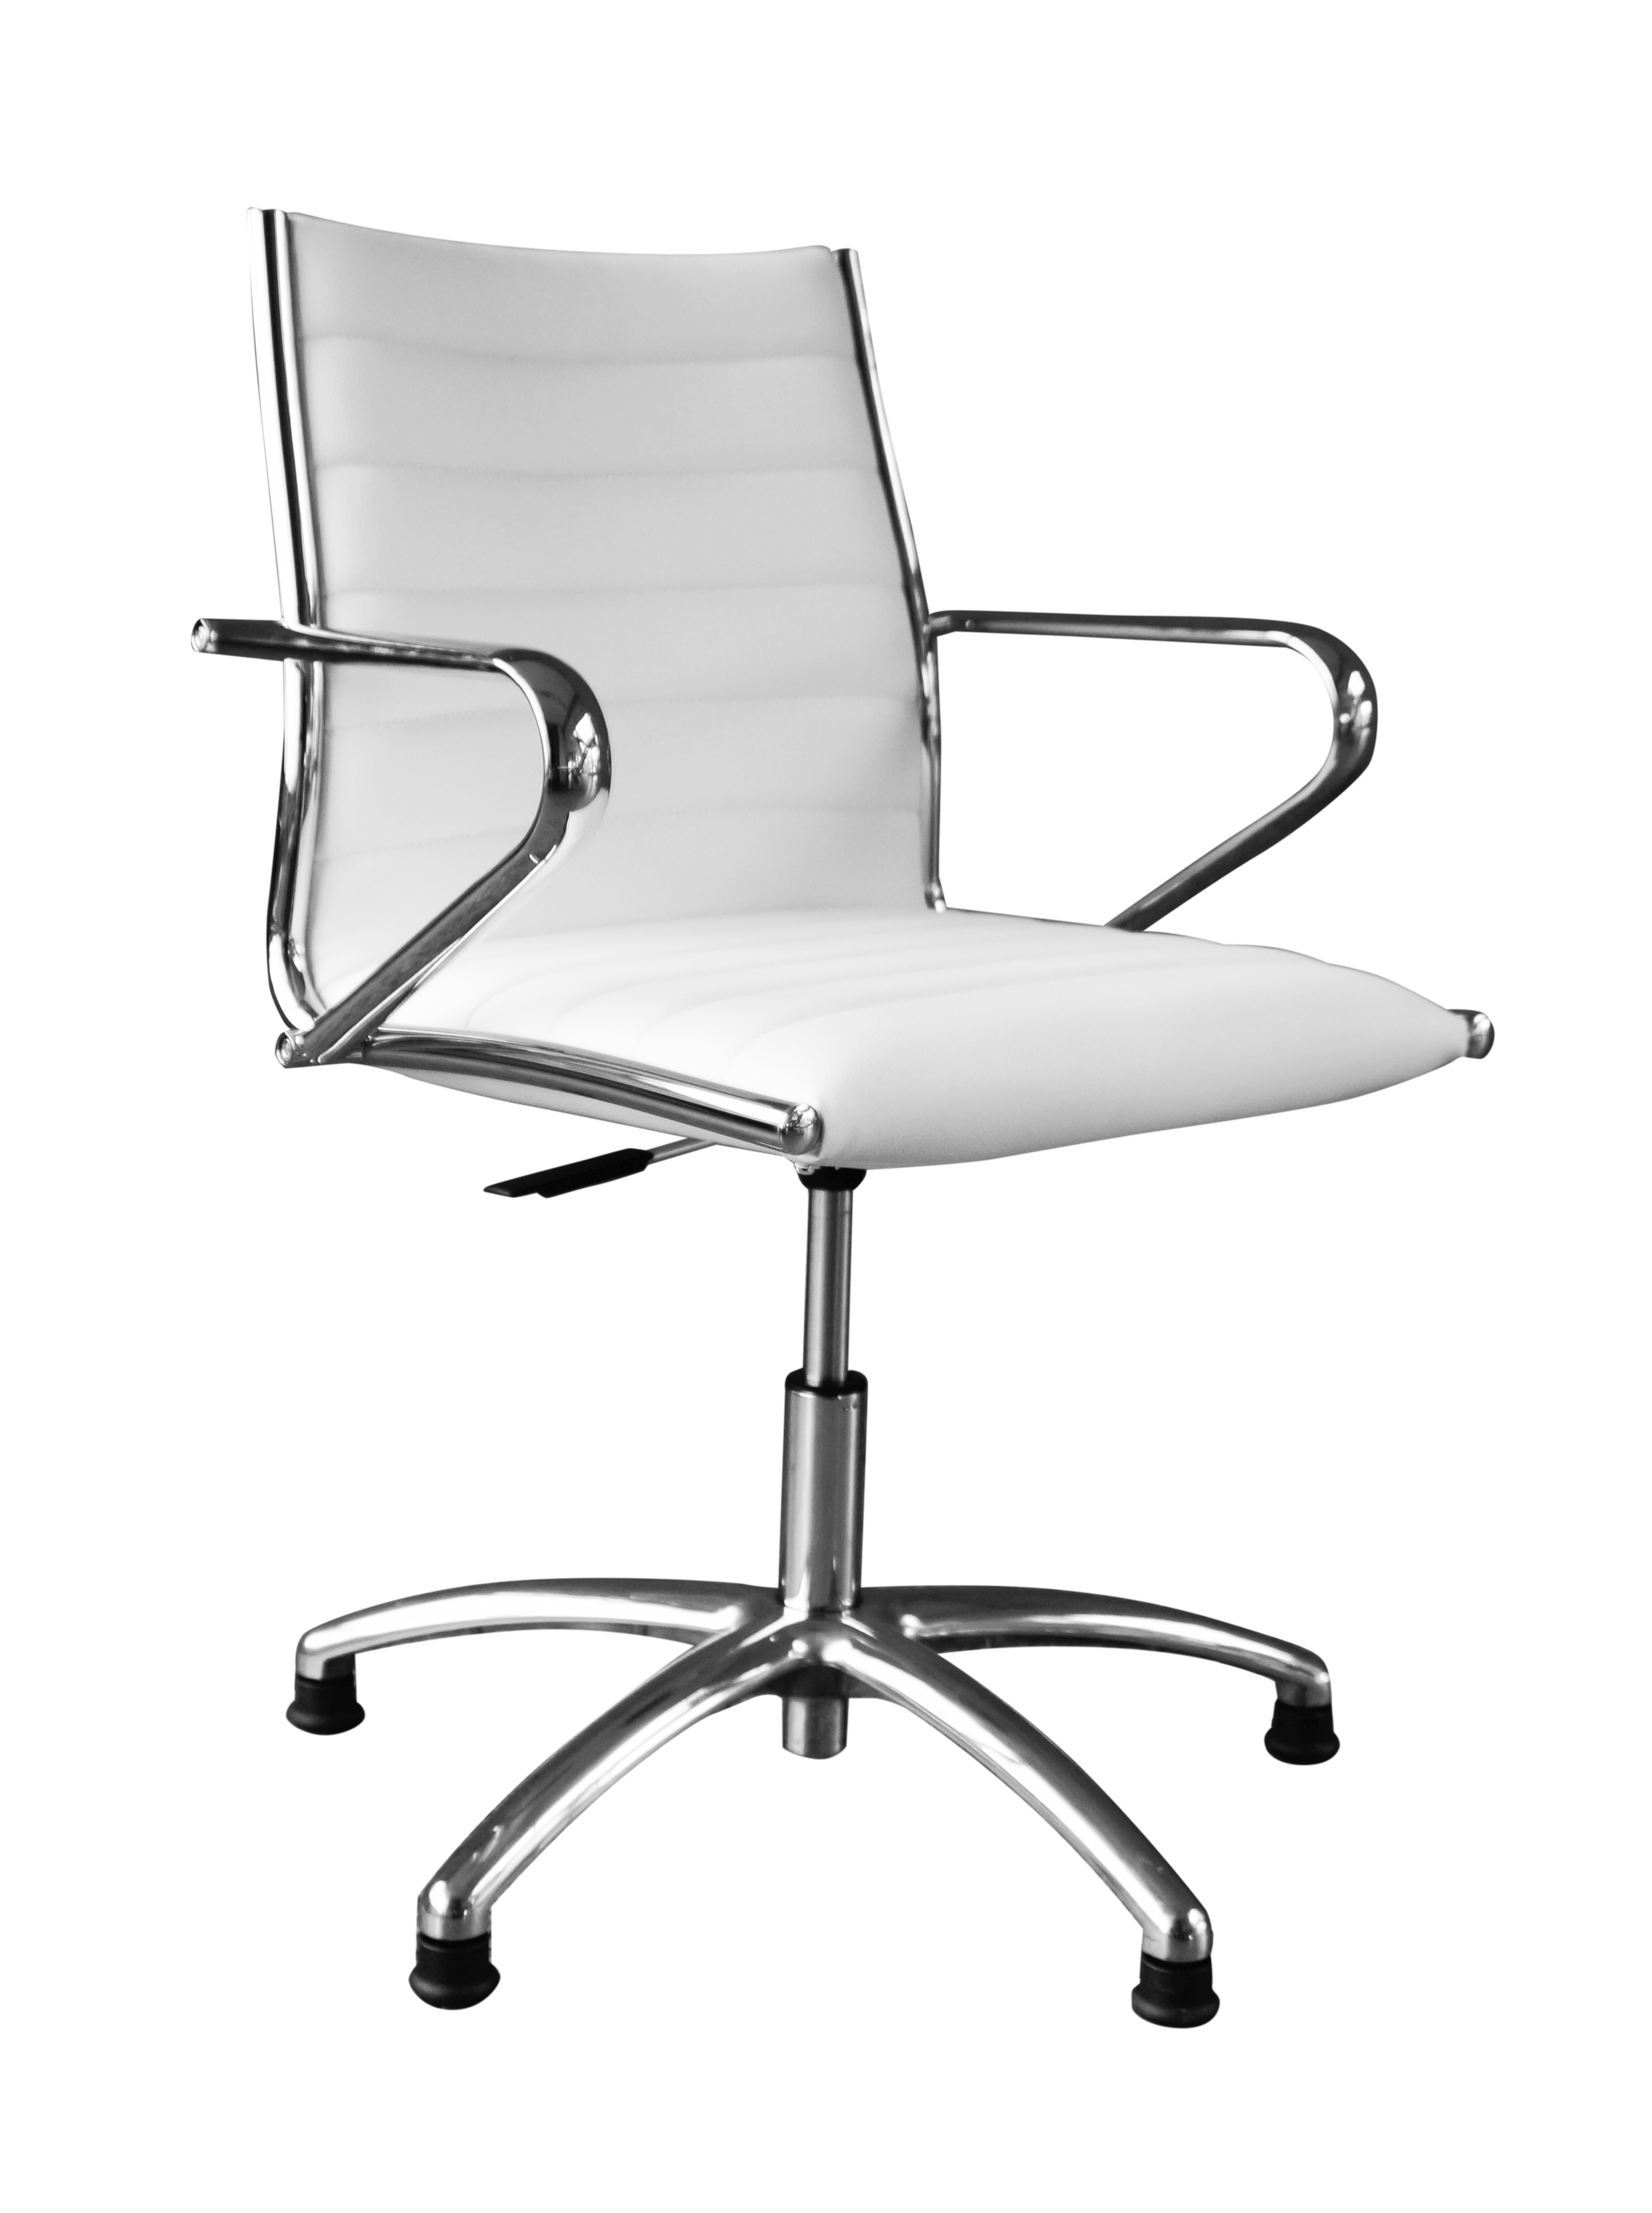 Büro-Drehstuhl CHEF TWO: Meeting-Stuhl (mit Lehne & Rollen - rollbar, höhenverstellbar, Kunstleder - Office-Stuhl / Sessel)